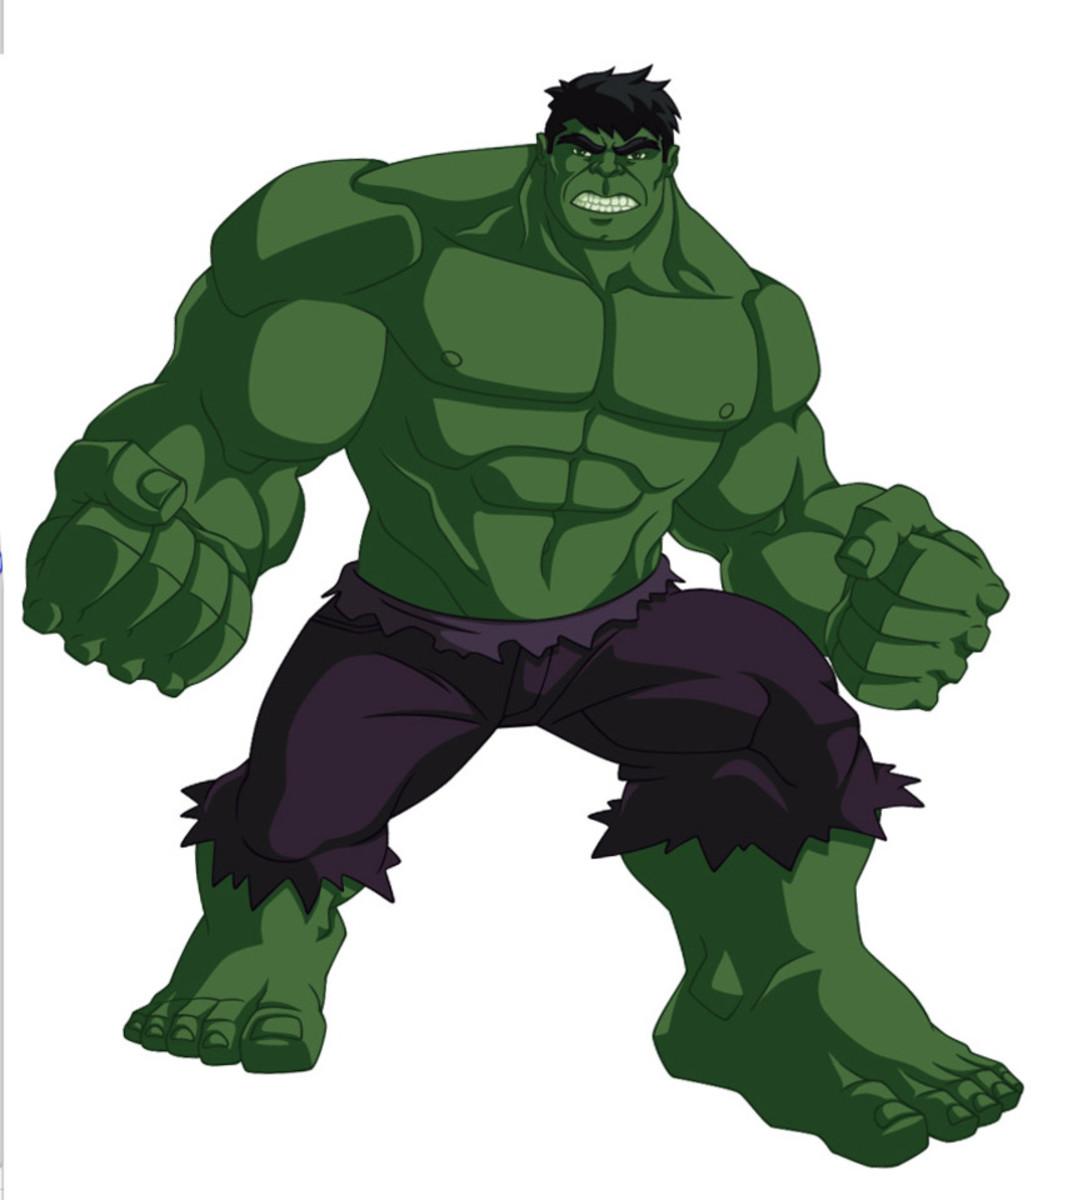 Hulk - Avengers Assemble